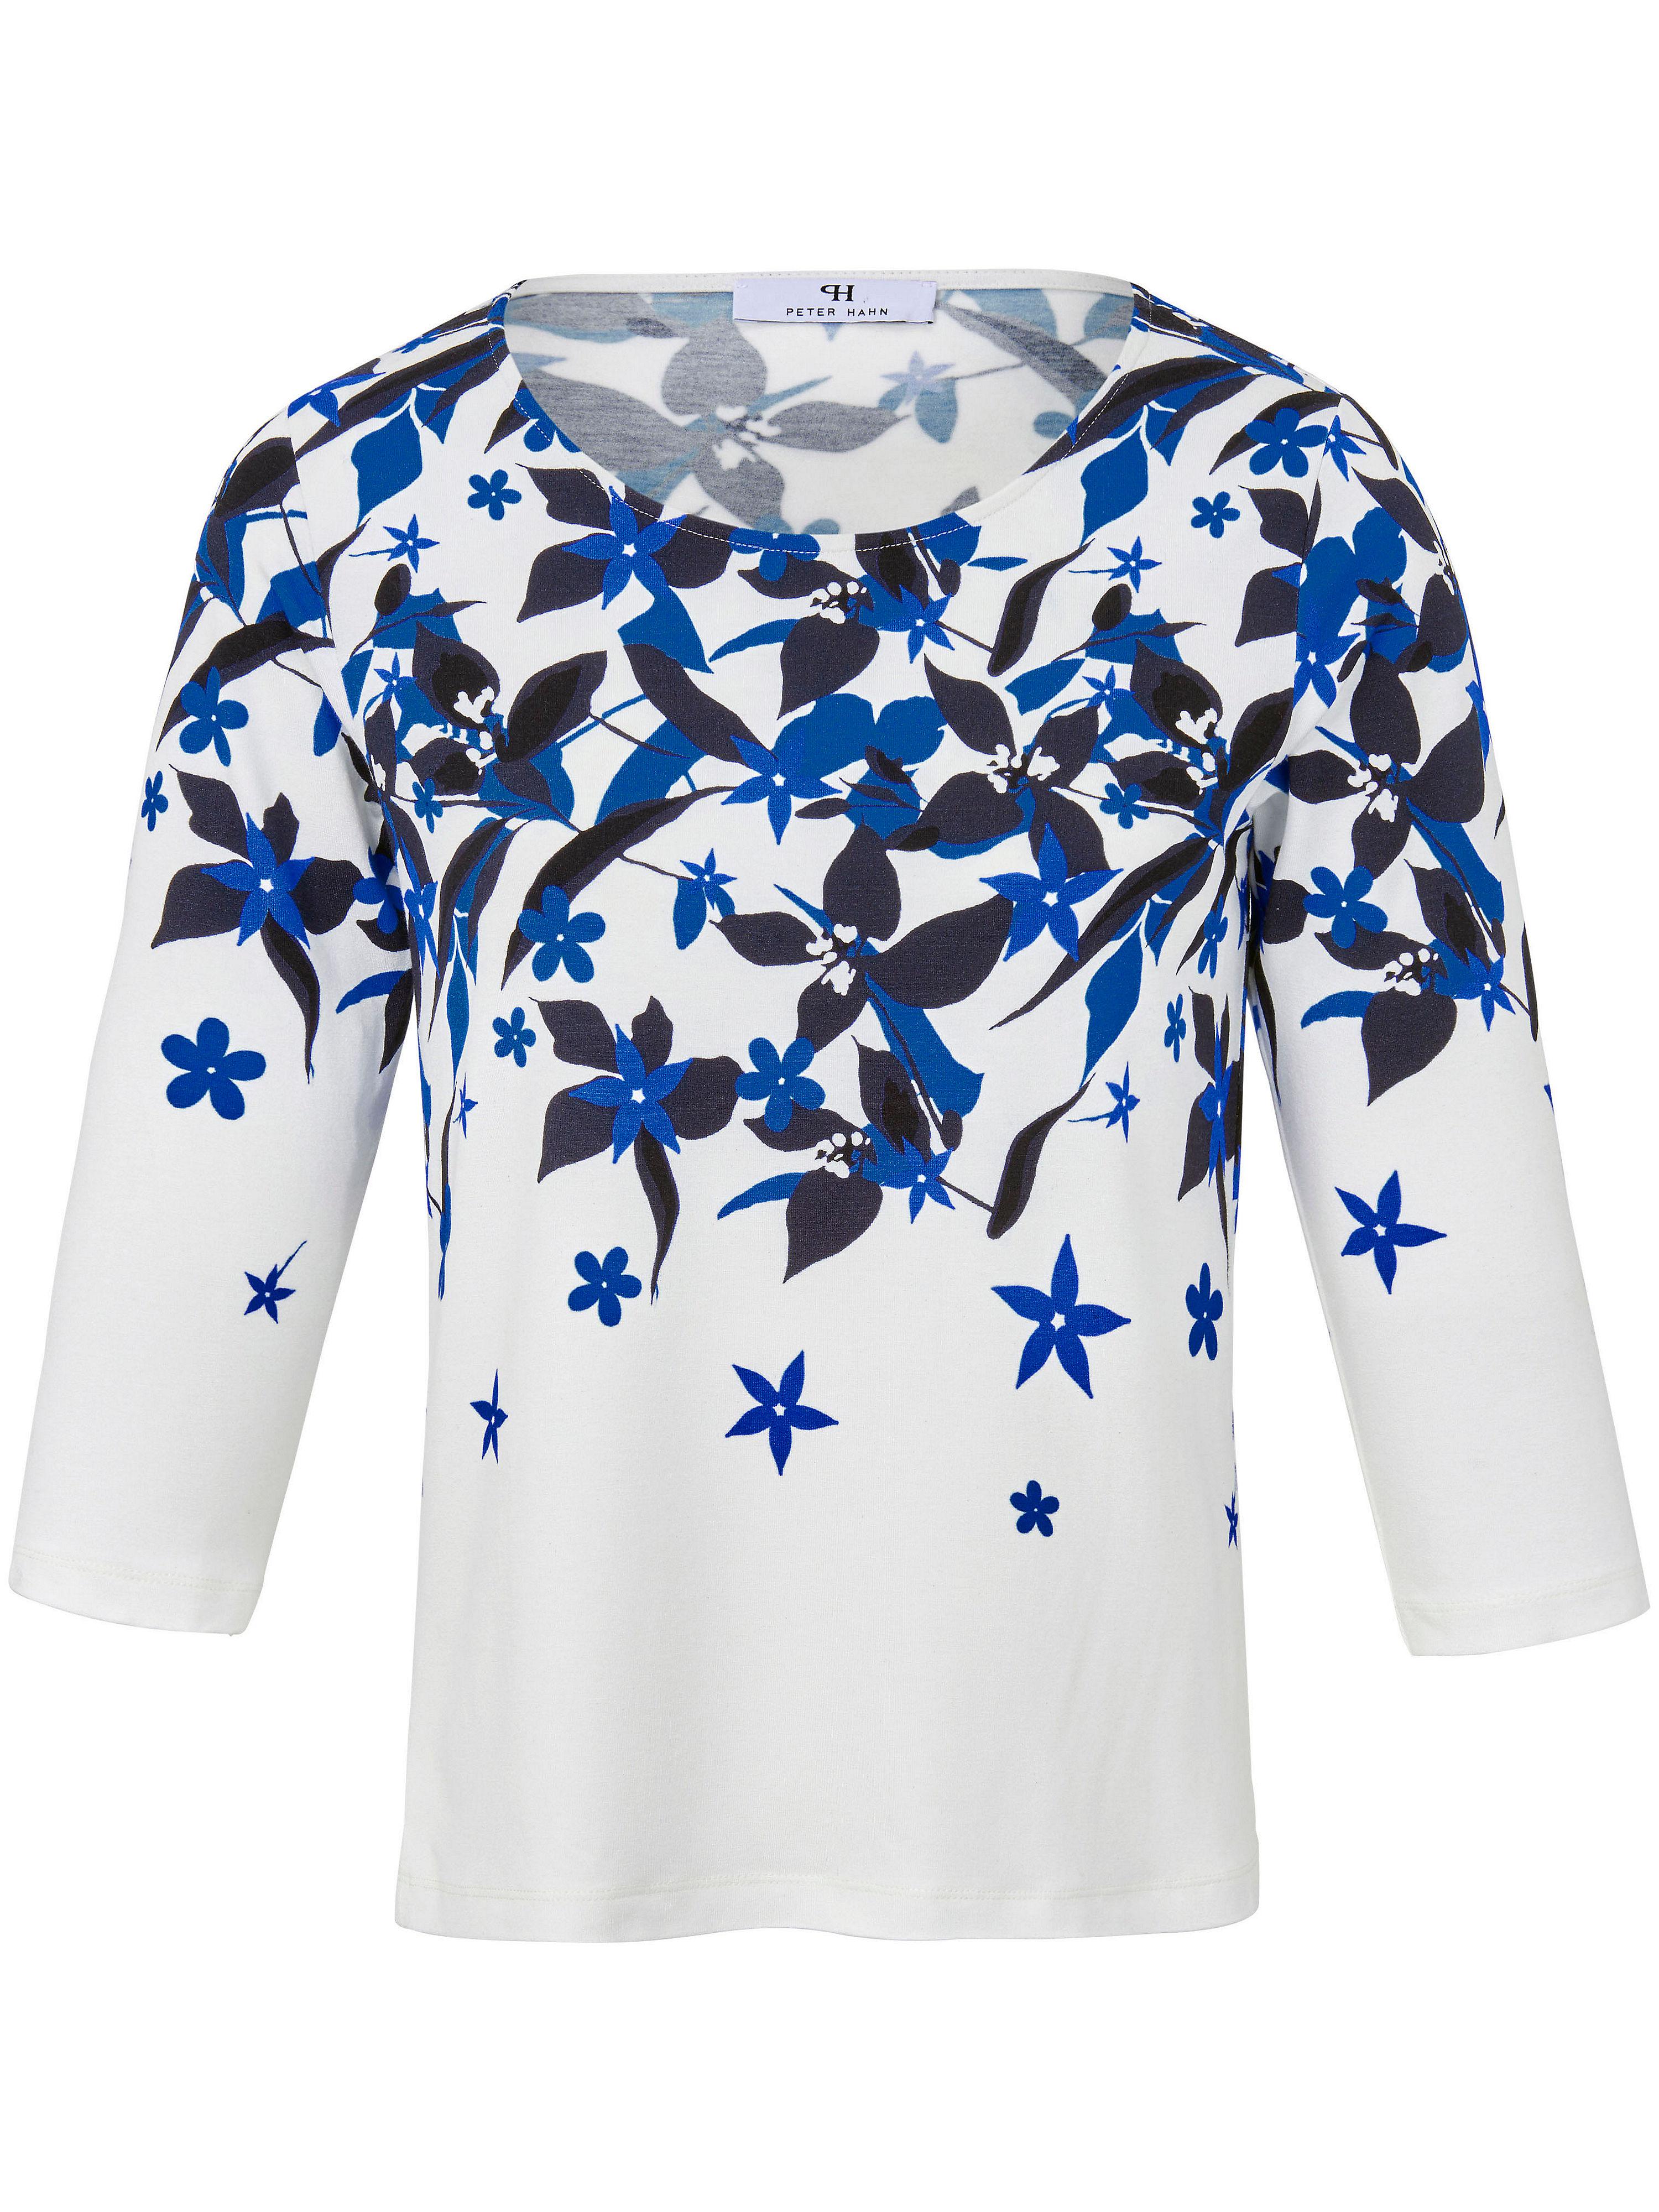 Le T-shirt imprimé grand teint, manches 3/4  Peter Hahn bleu taille 48